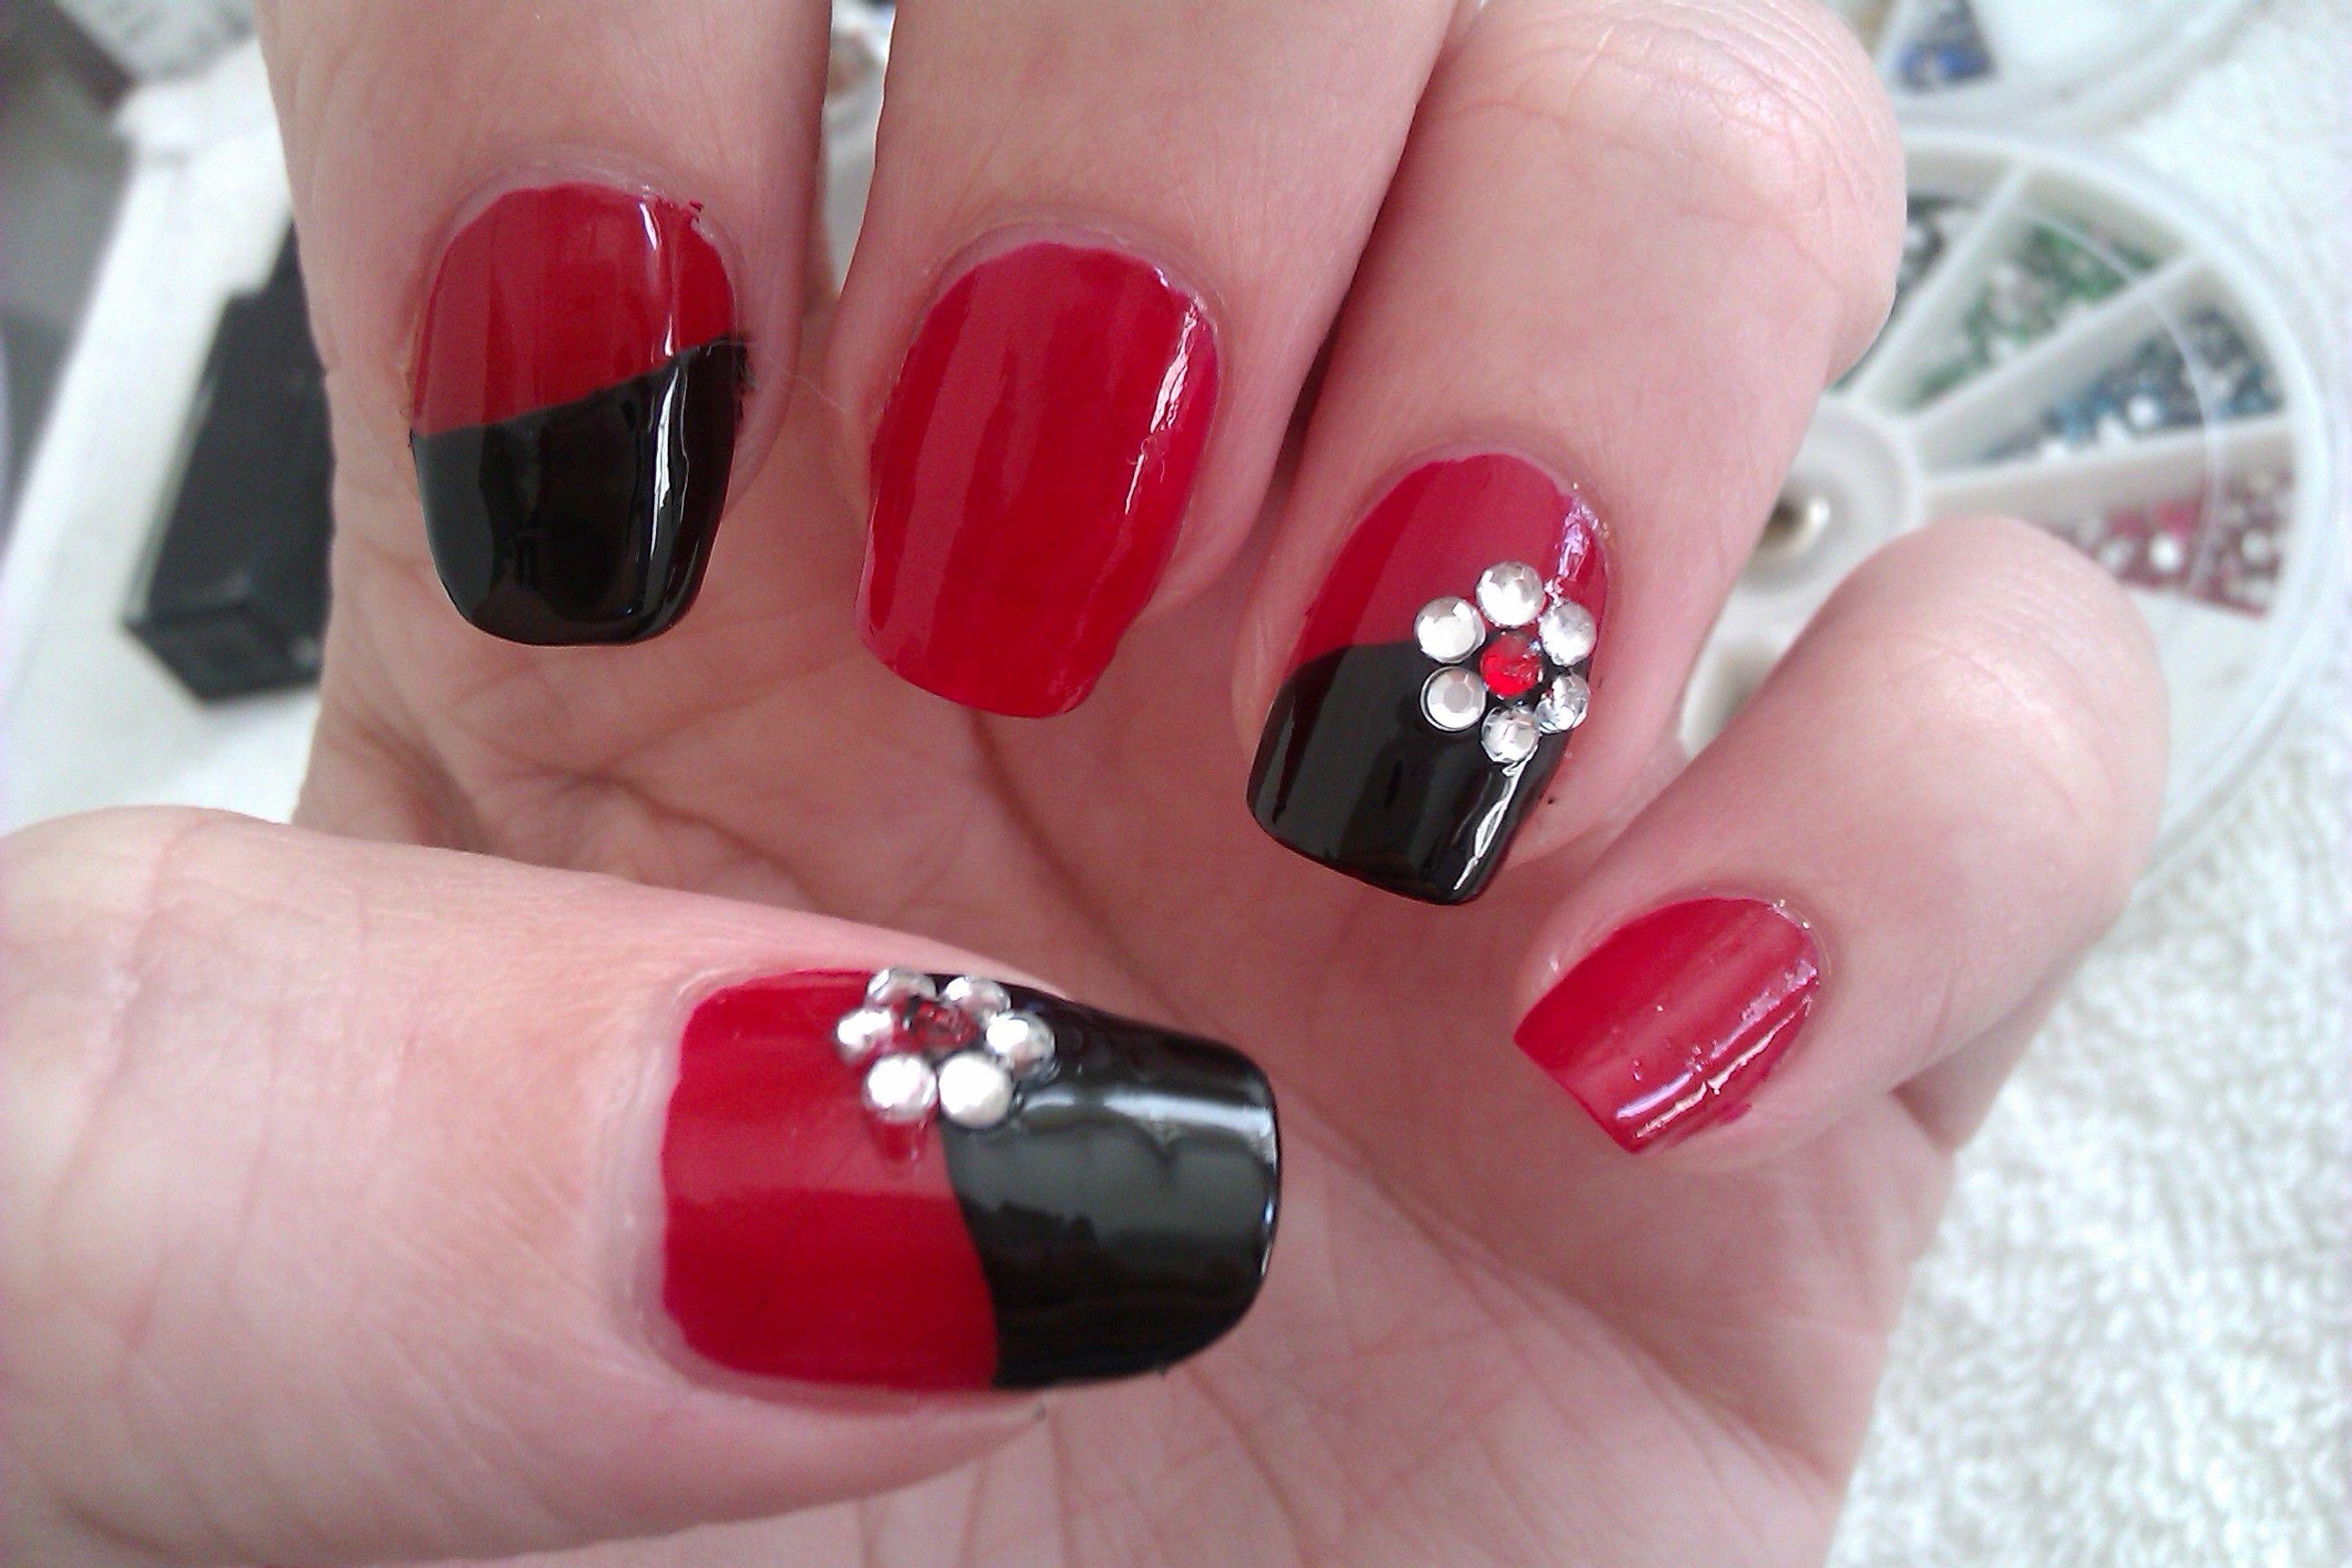 Pin by Dana Tapley on Cute Nail Designs | Pinterest